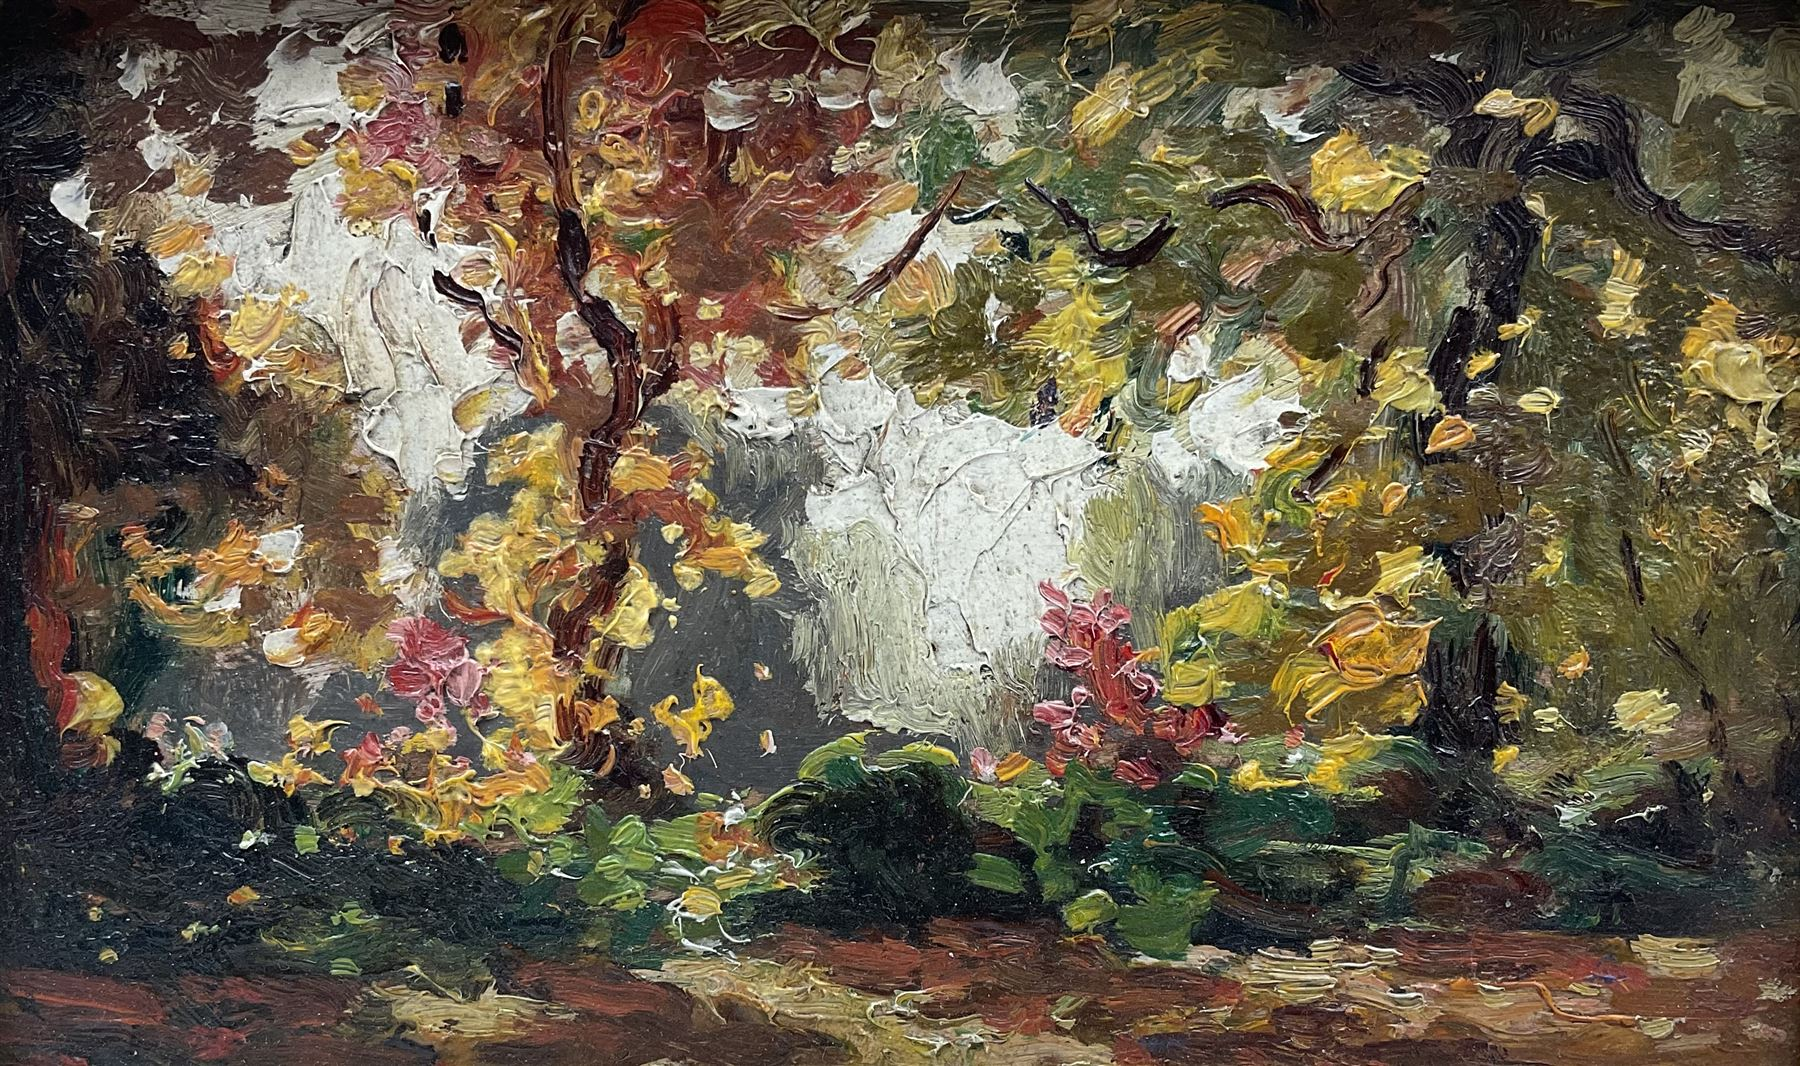 Attrib. James W Ferguson (Scottish 1916-1963): Wooded Garden